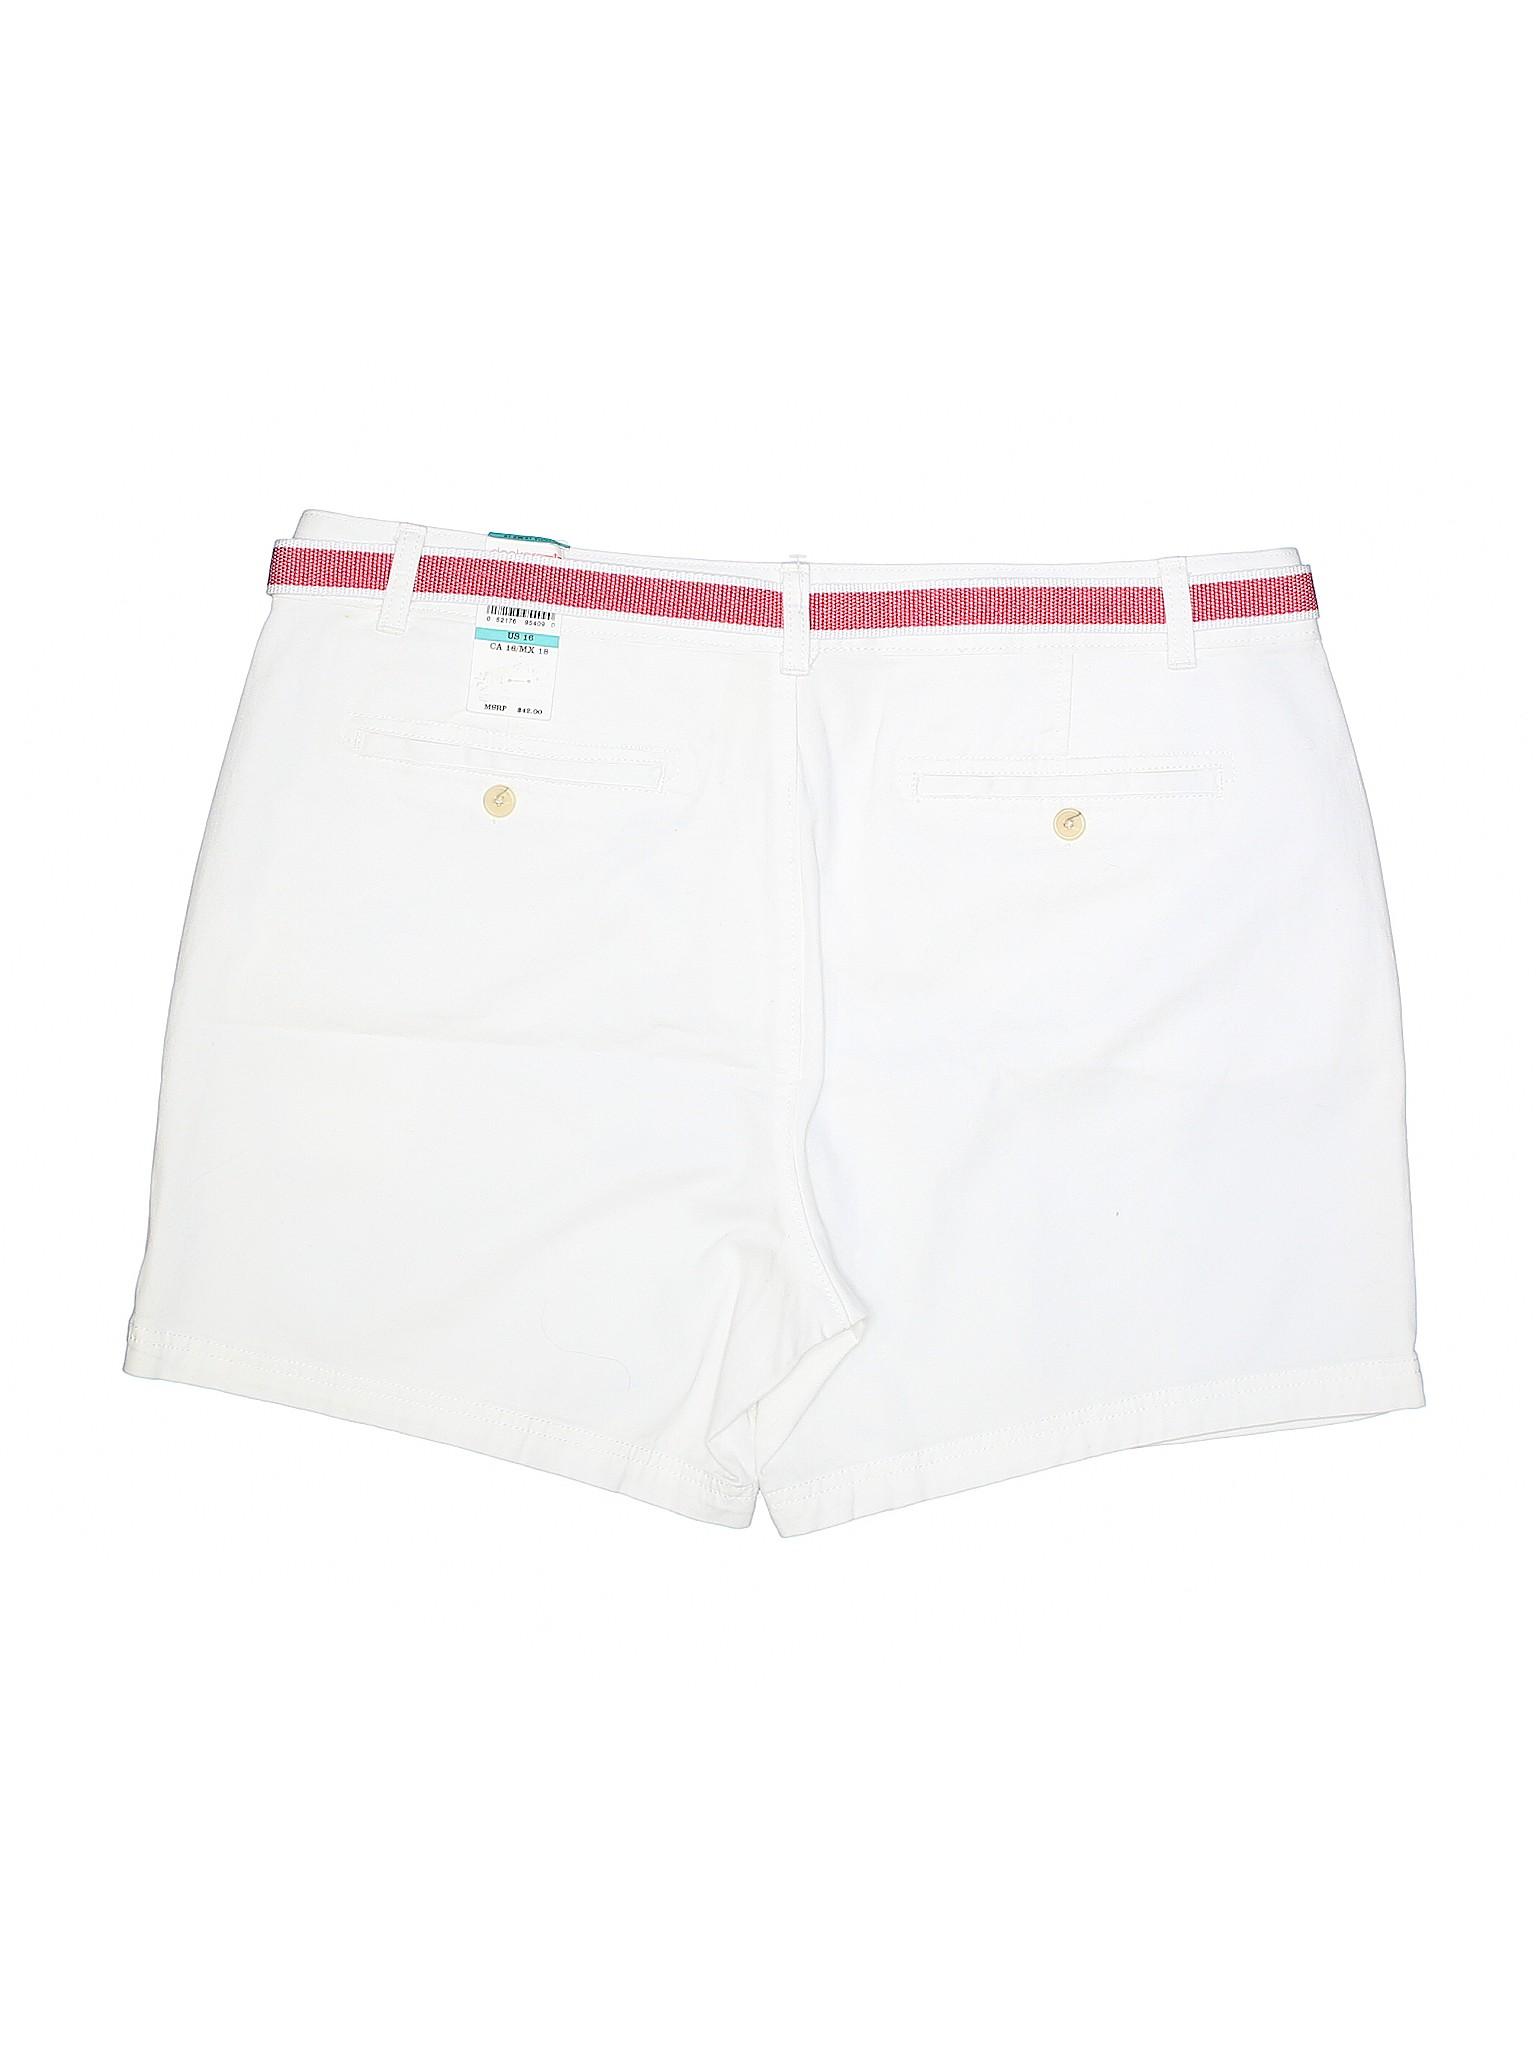 Shorts Shorts Boutique Dockers Khaki Khaki Dockers Boutique gxOBdZqZw